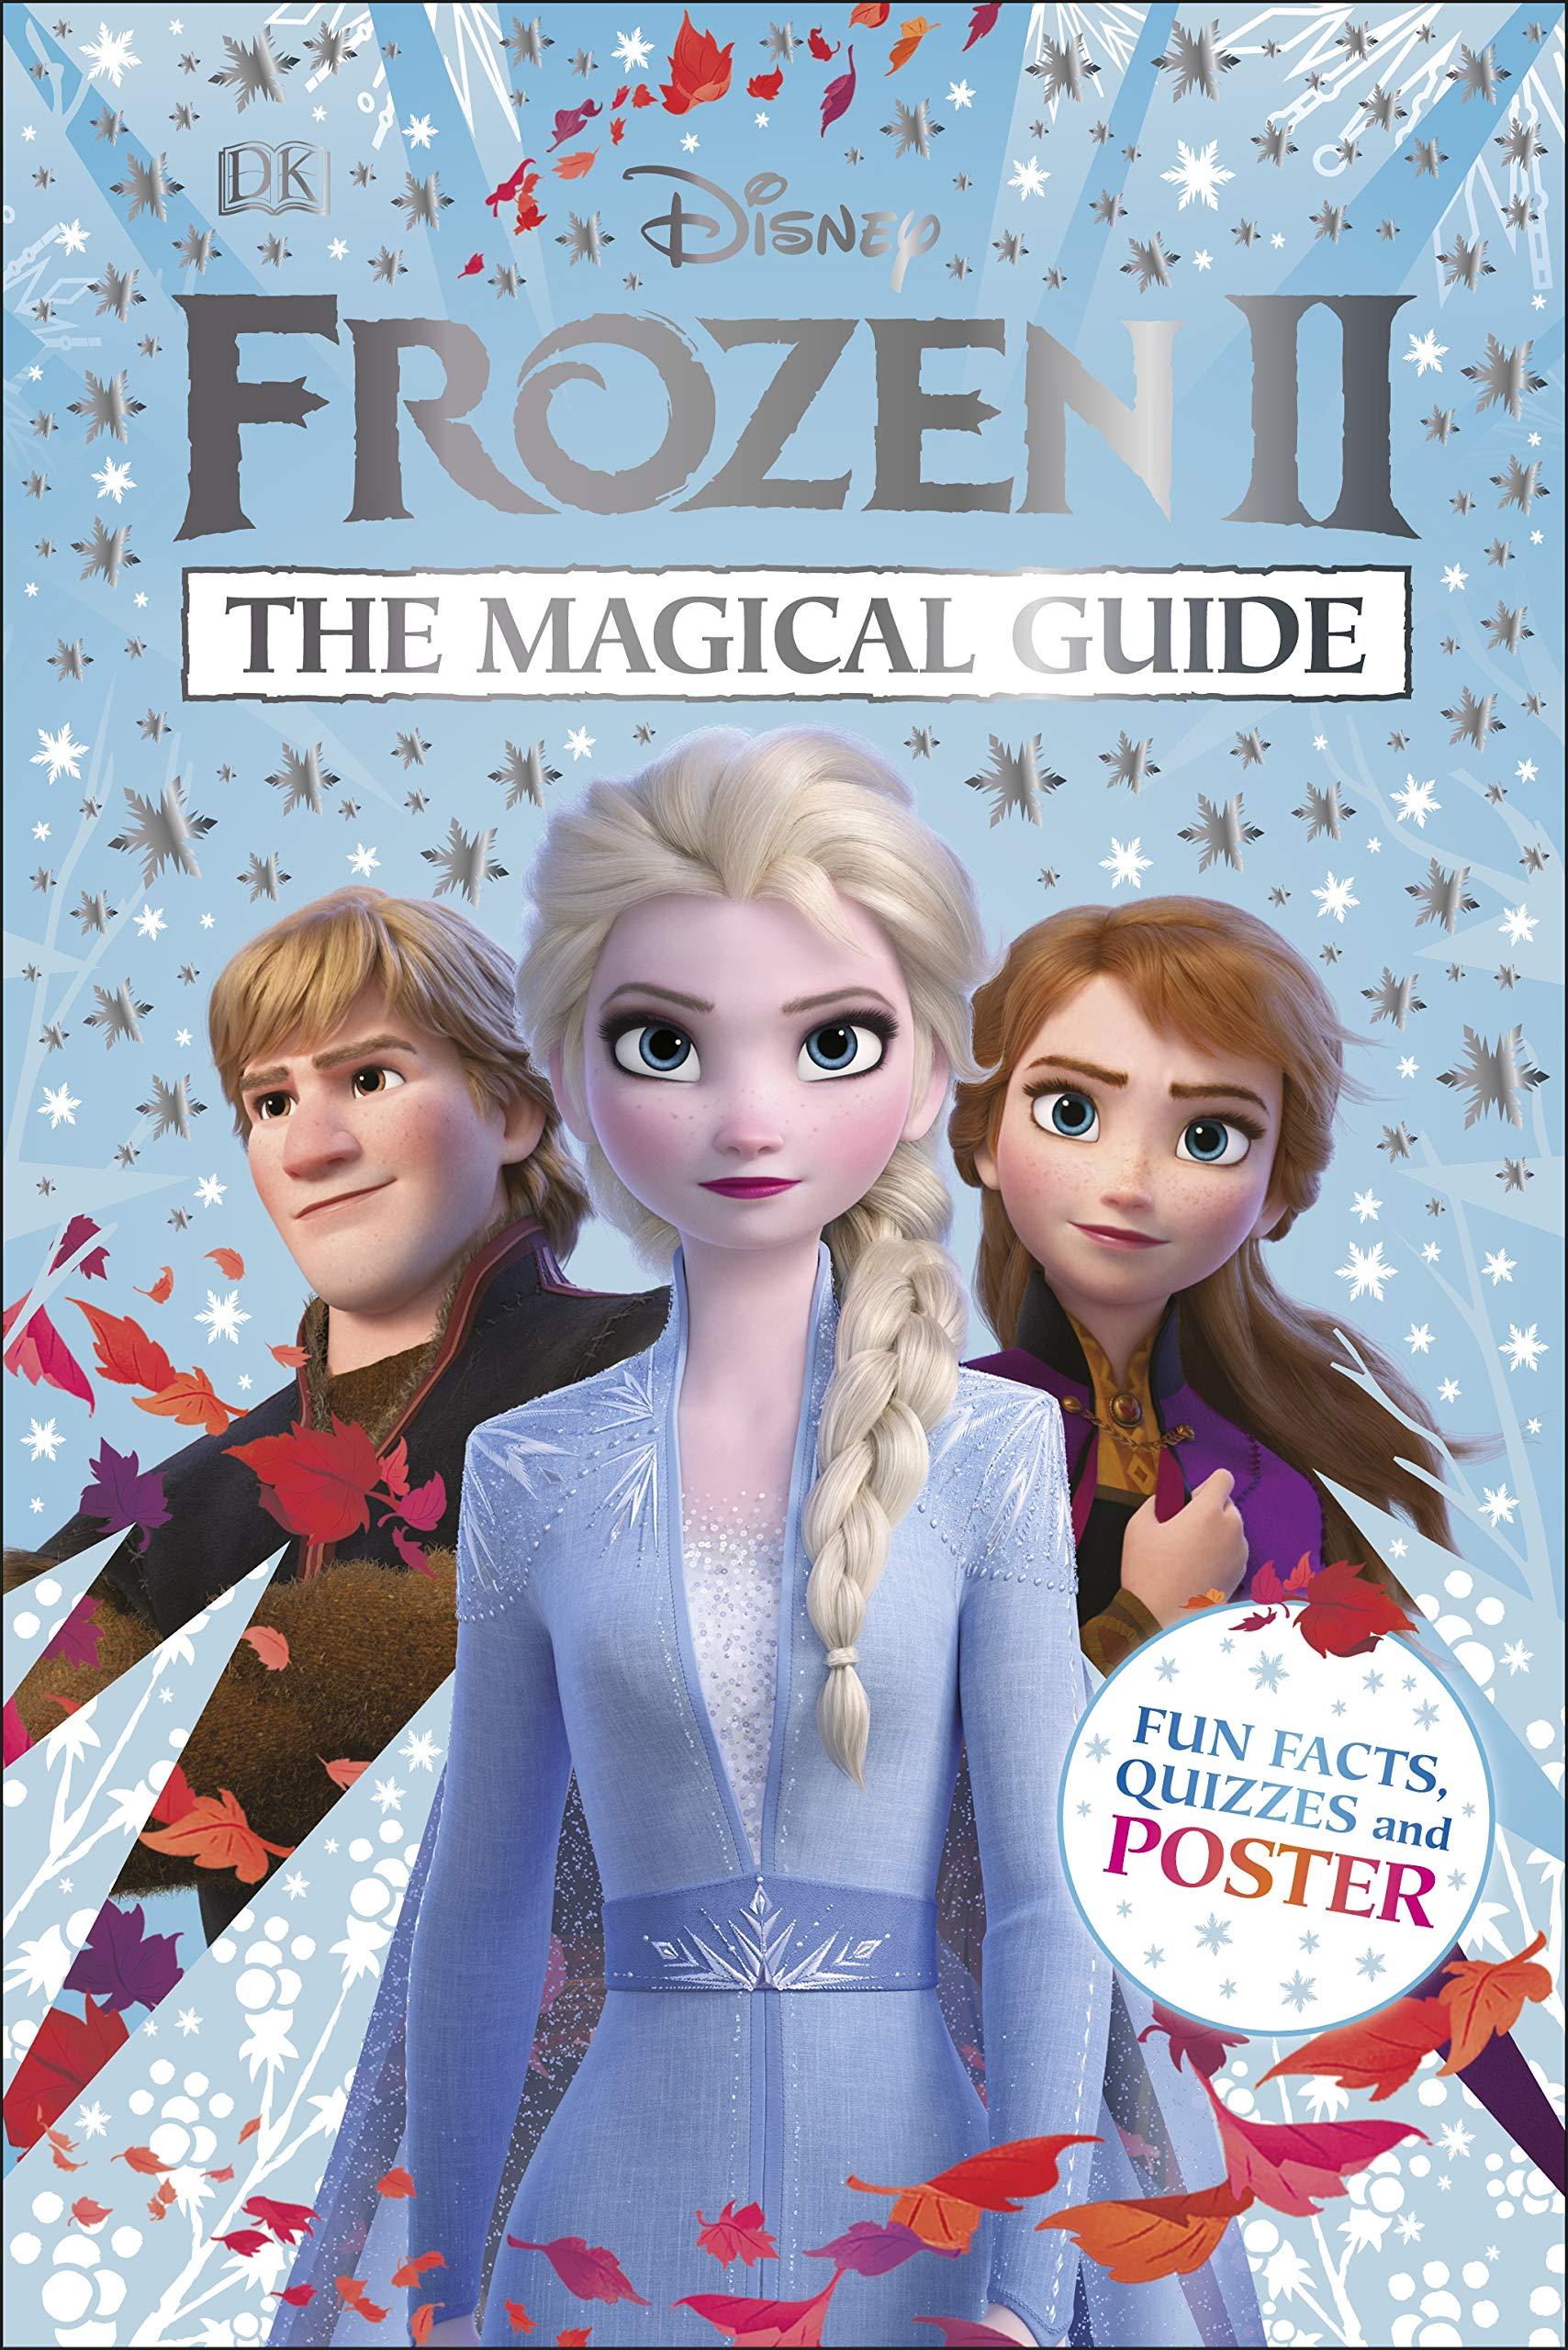 Frozen 2 Book Cover